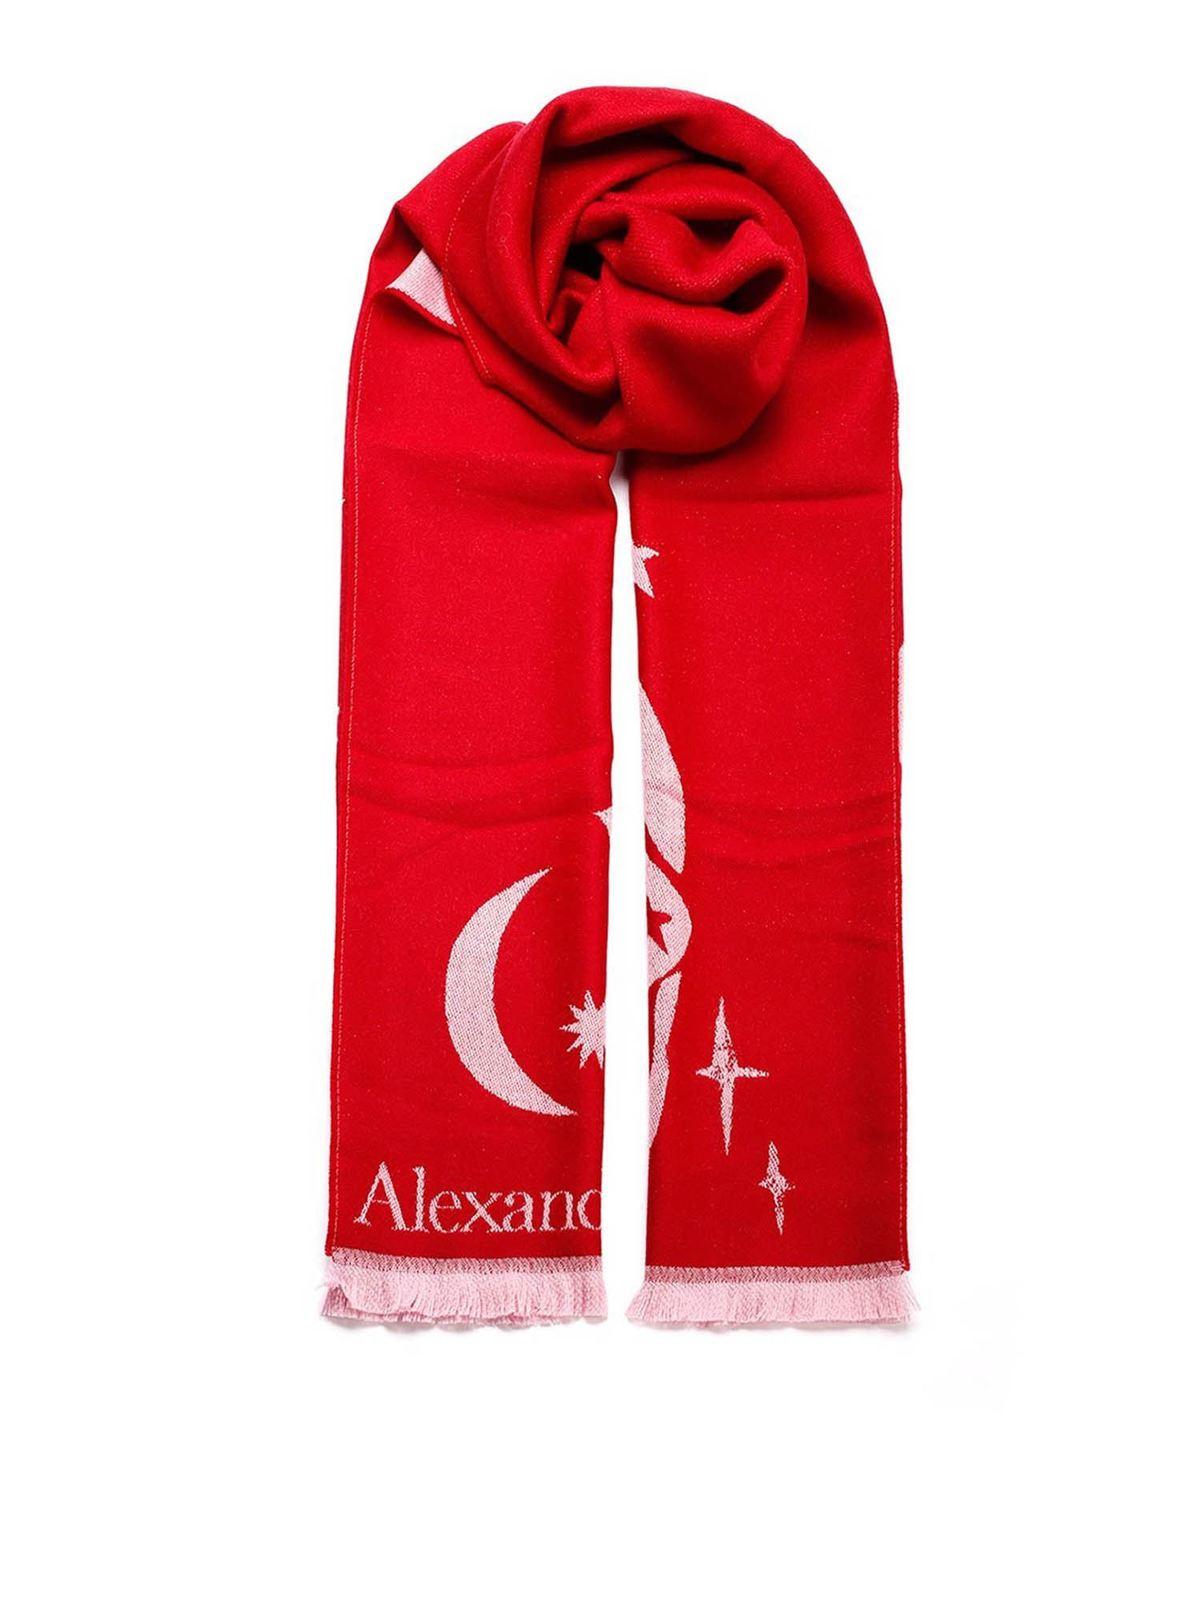 Alexander Mcqueen Mystical Overs Scarf In Red